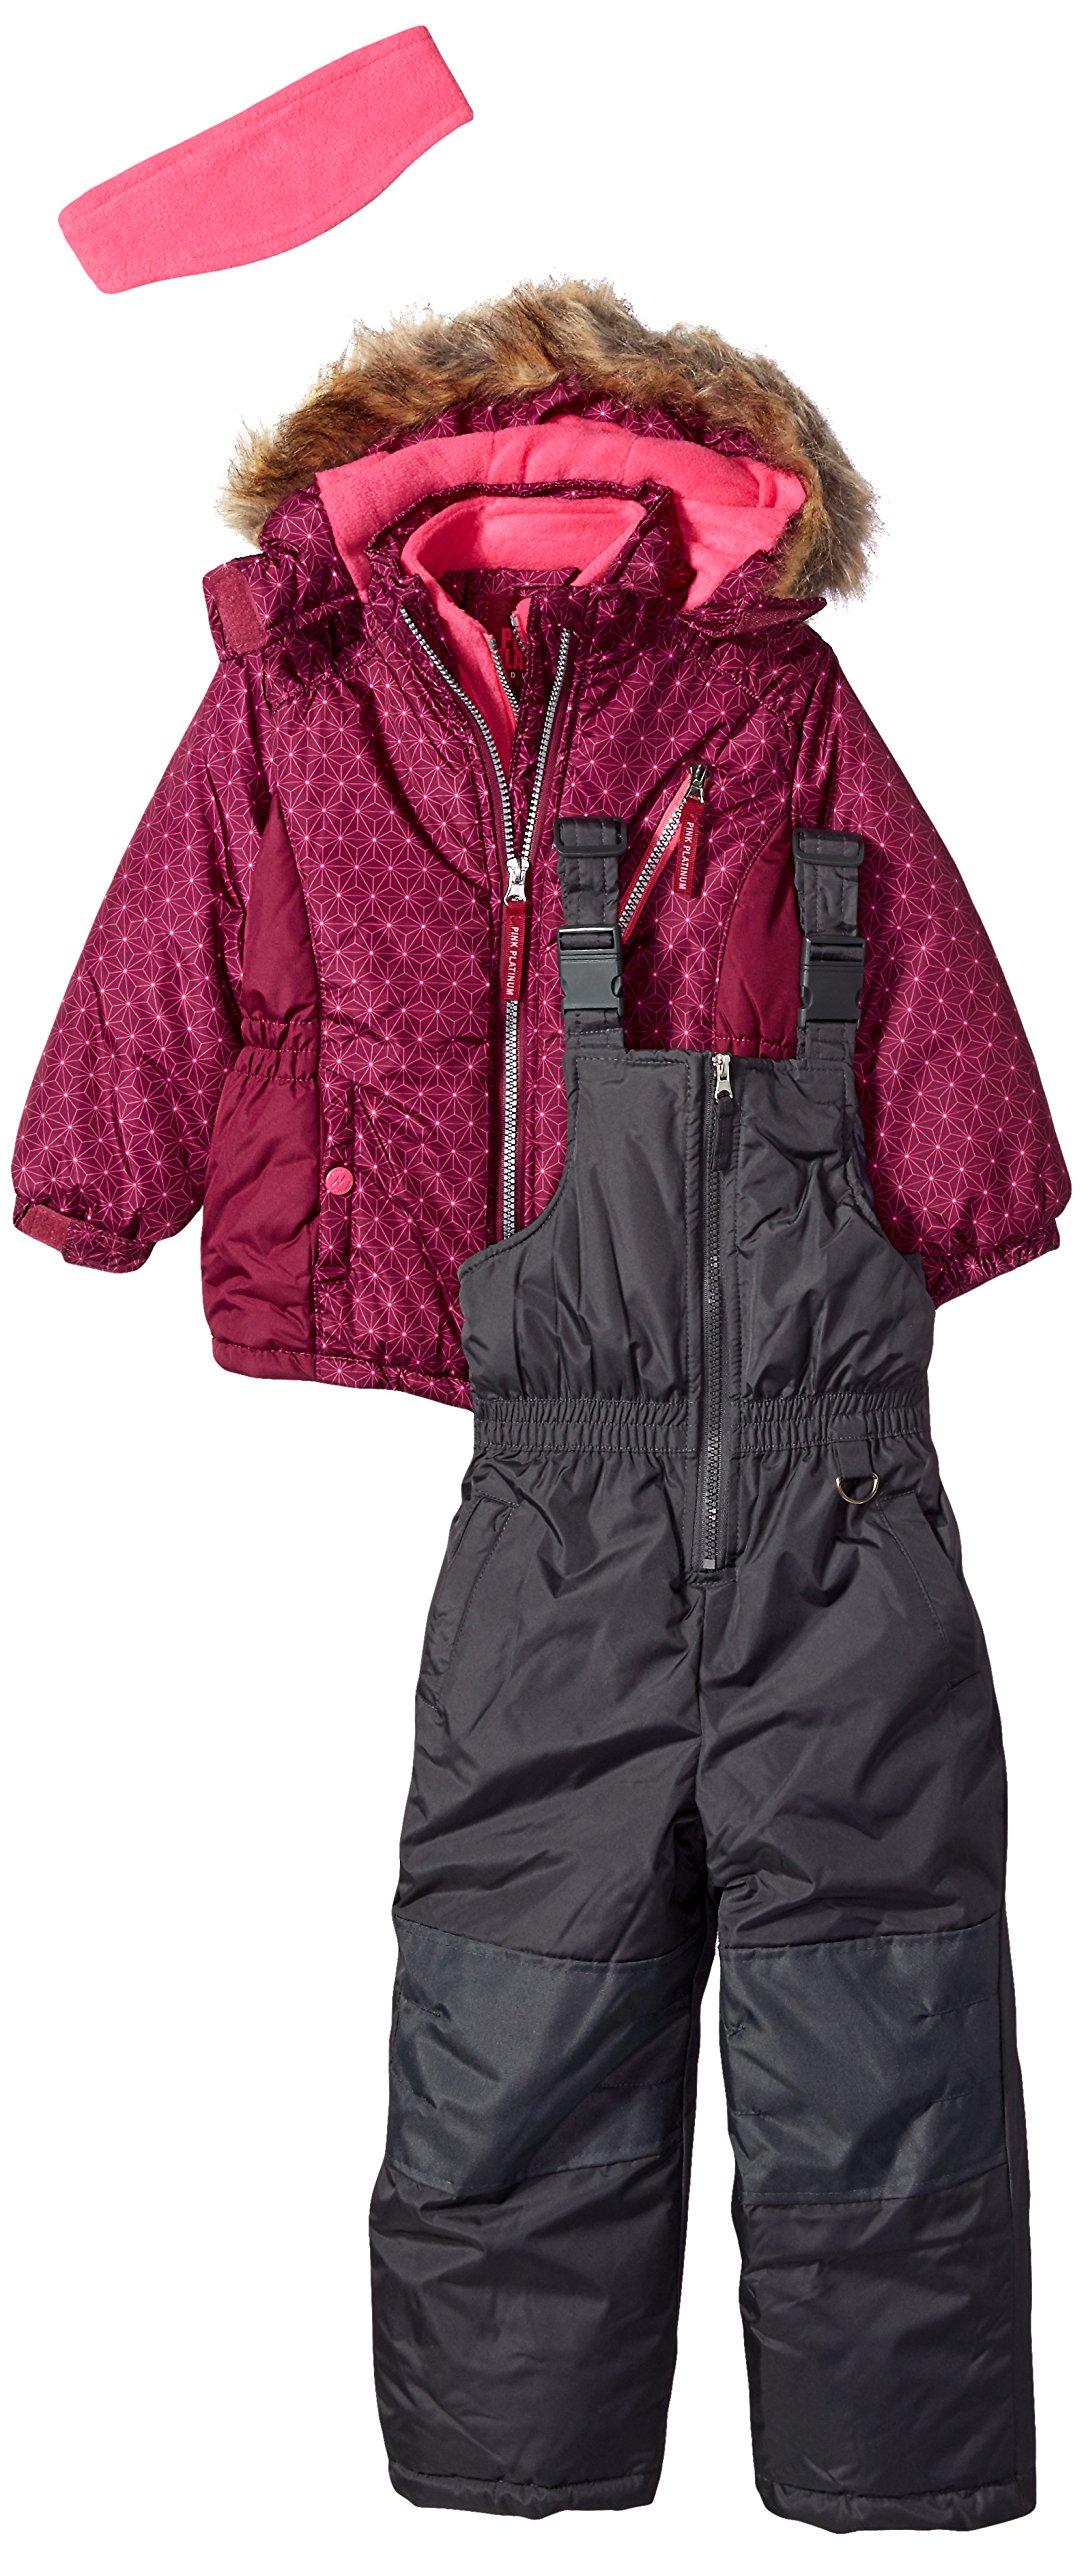 Pink Platinum Girls' Little' Printed Super Snowsuit, Magenta, 4 by Pink Platinum